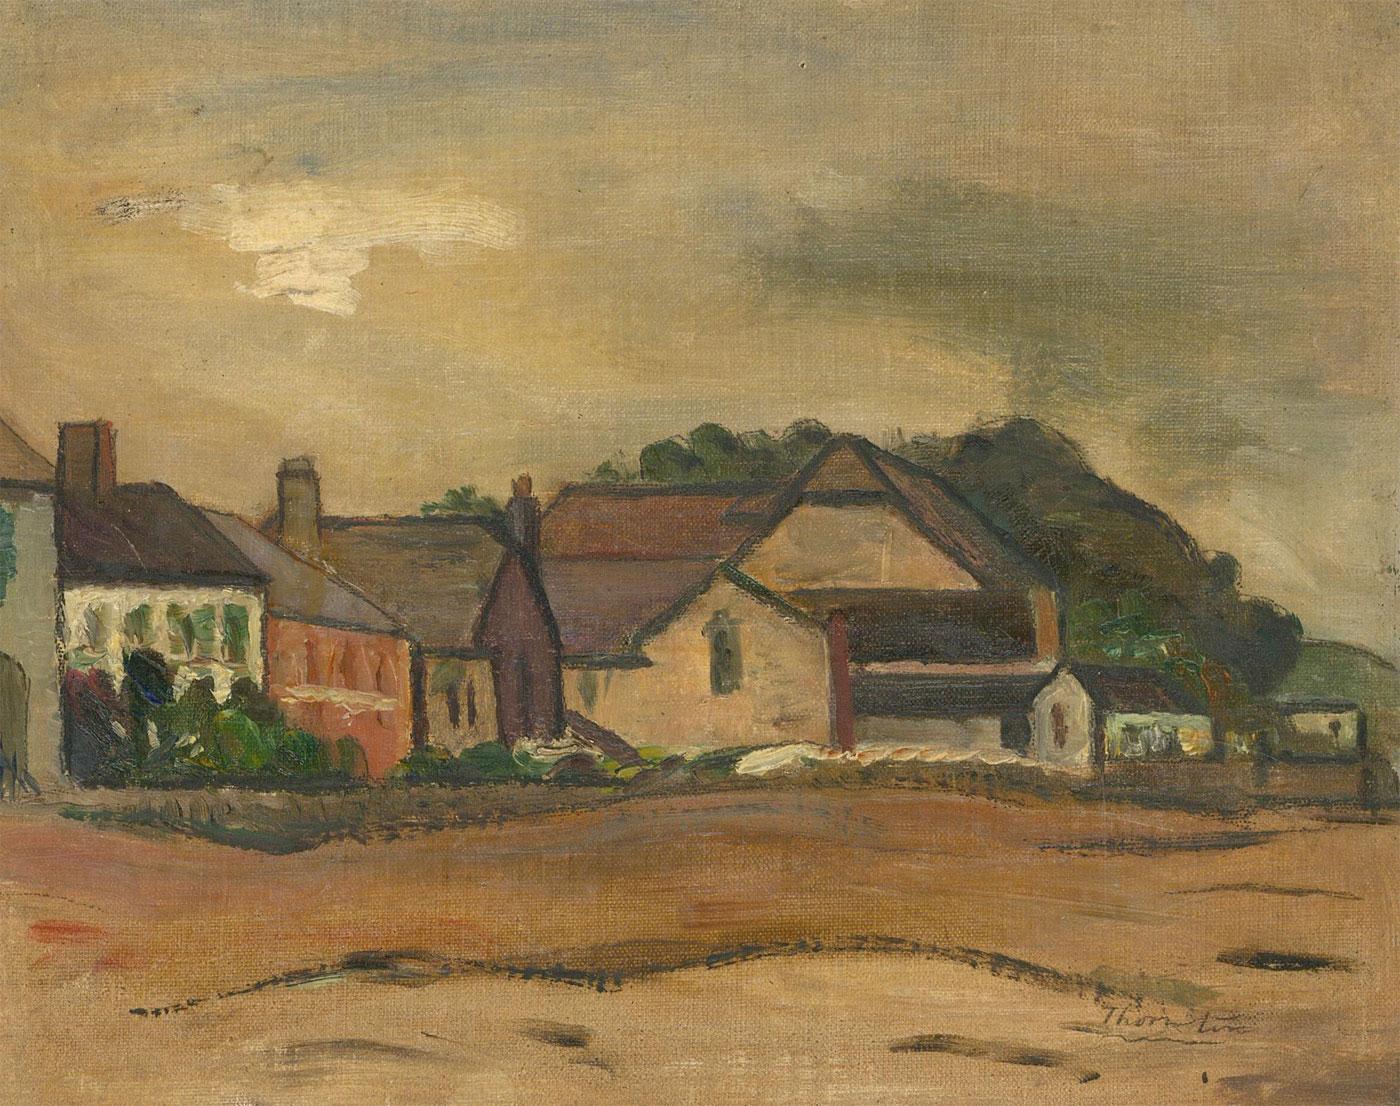 Alfred Henry Robinson Thornton NEAC (1863-1939) - Oil, Instow, Devon